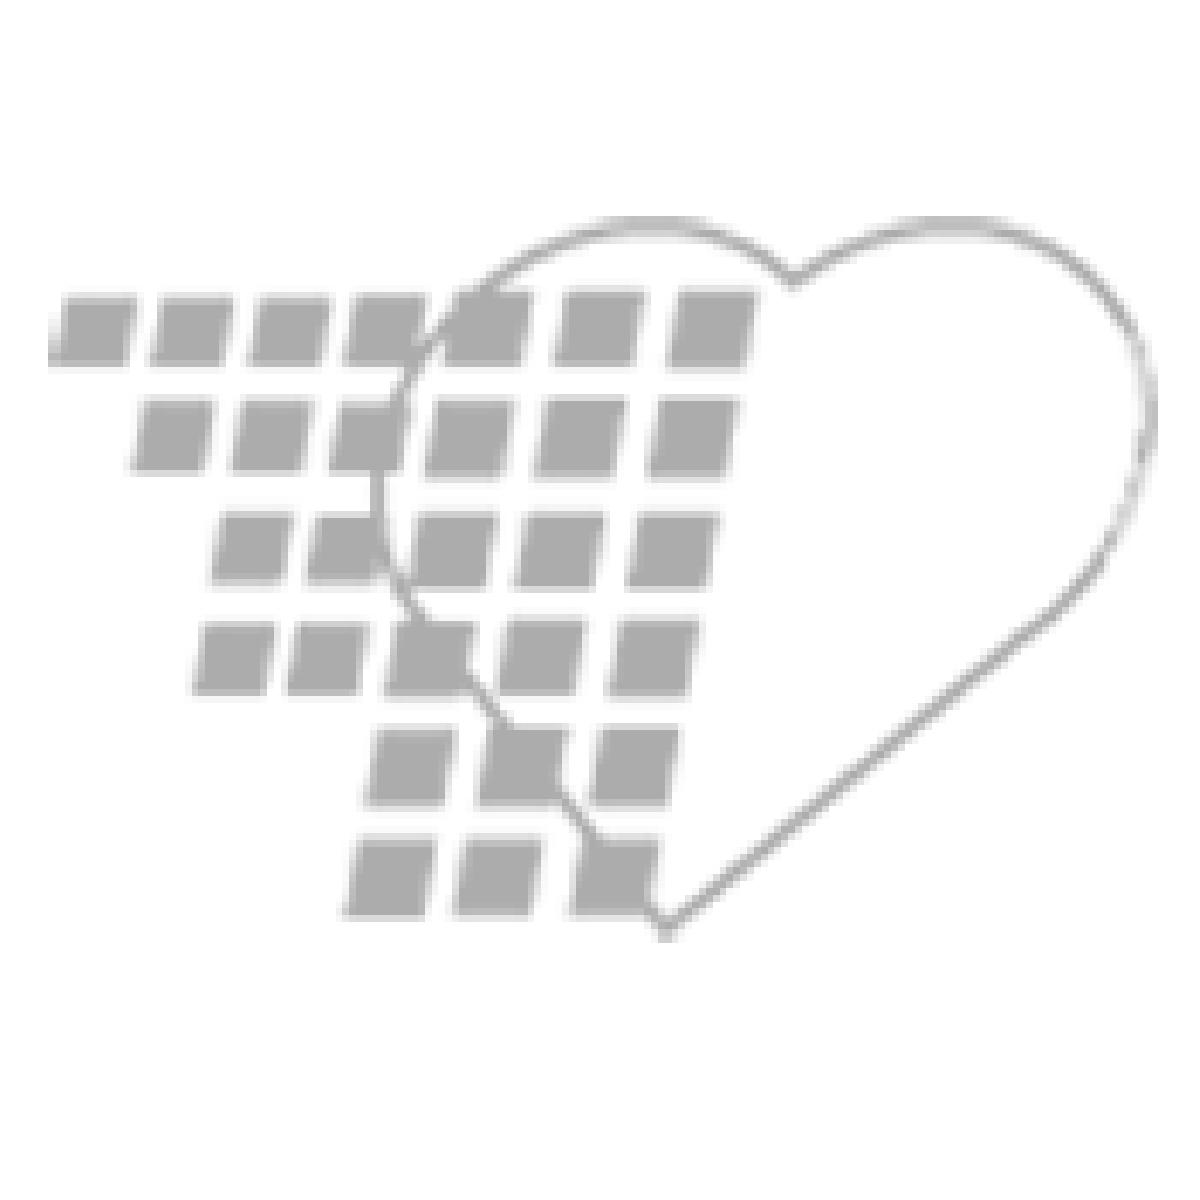 06-93-6003 - Demo Dose® Simulated Blood A Negative